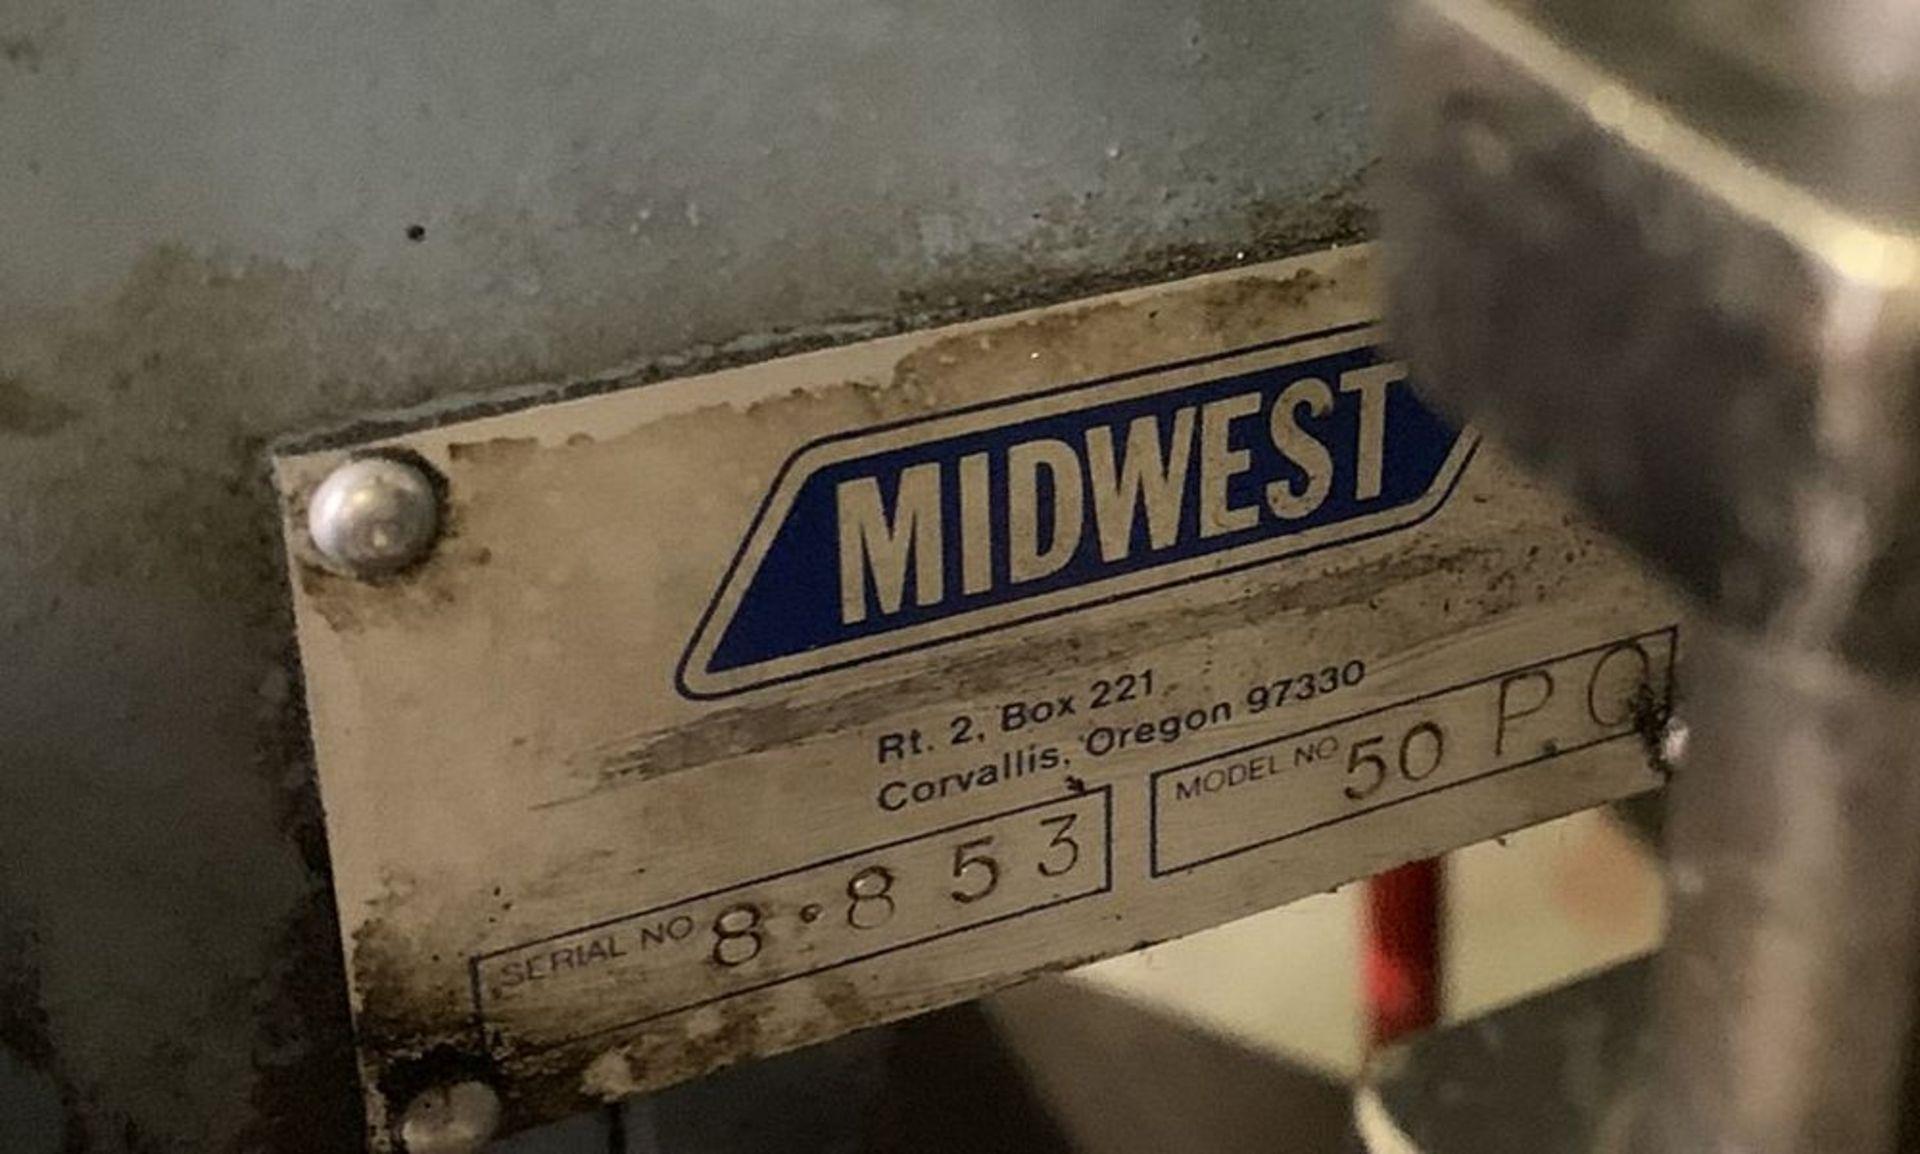 Lot 2 - 50 Ton Midwest Hydraulic Press Single Station Punch Model 50 P.O.